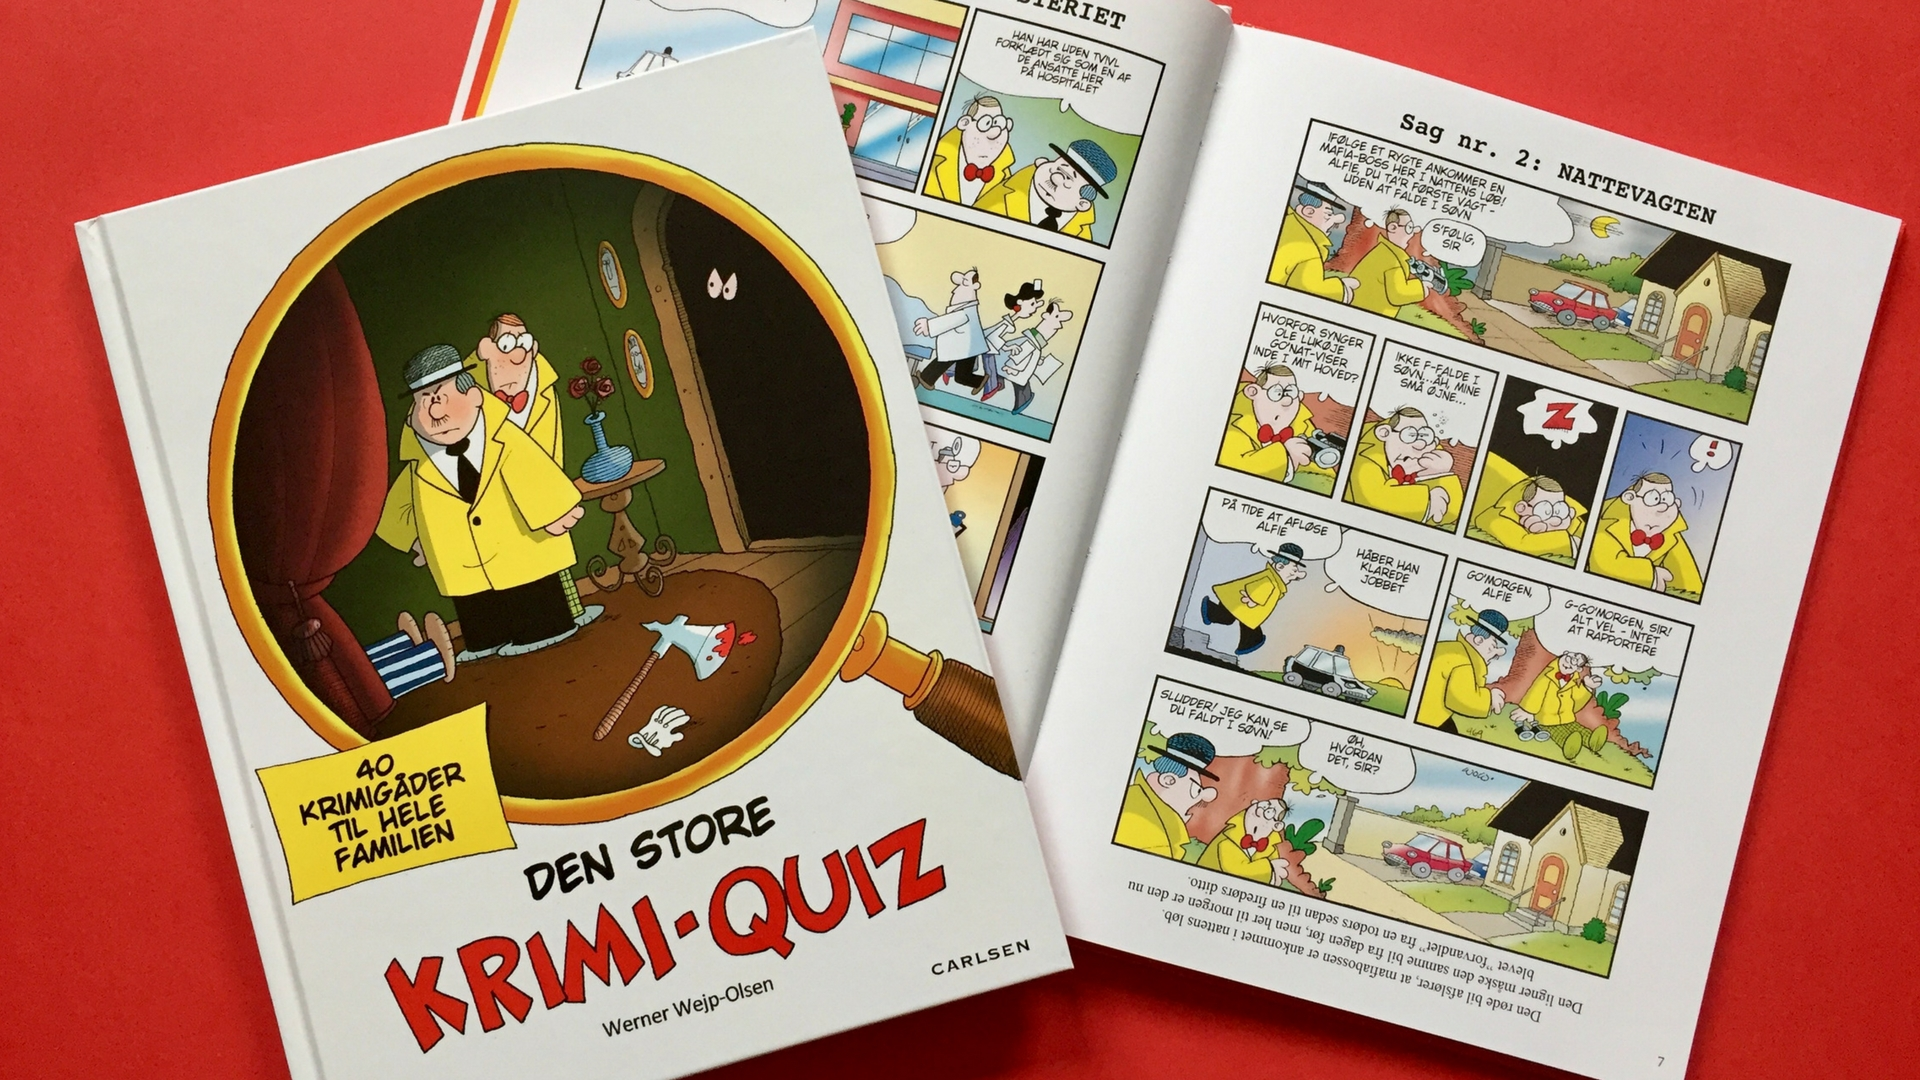 Den store krimi-quiz, krimigåder, krimi-gåder, quiz, krimi-quiz, werner wejp-olsen